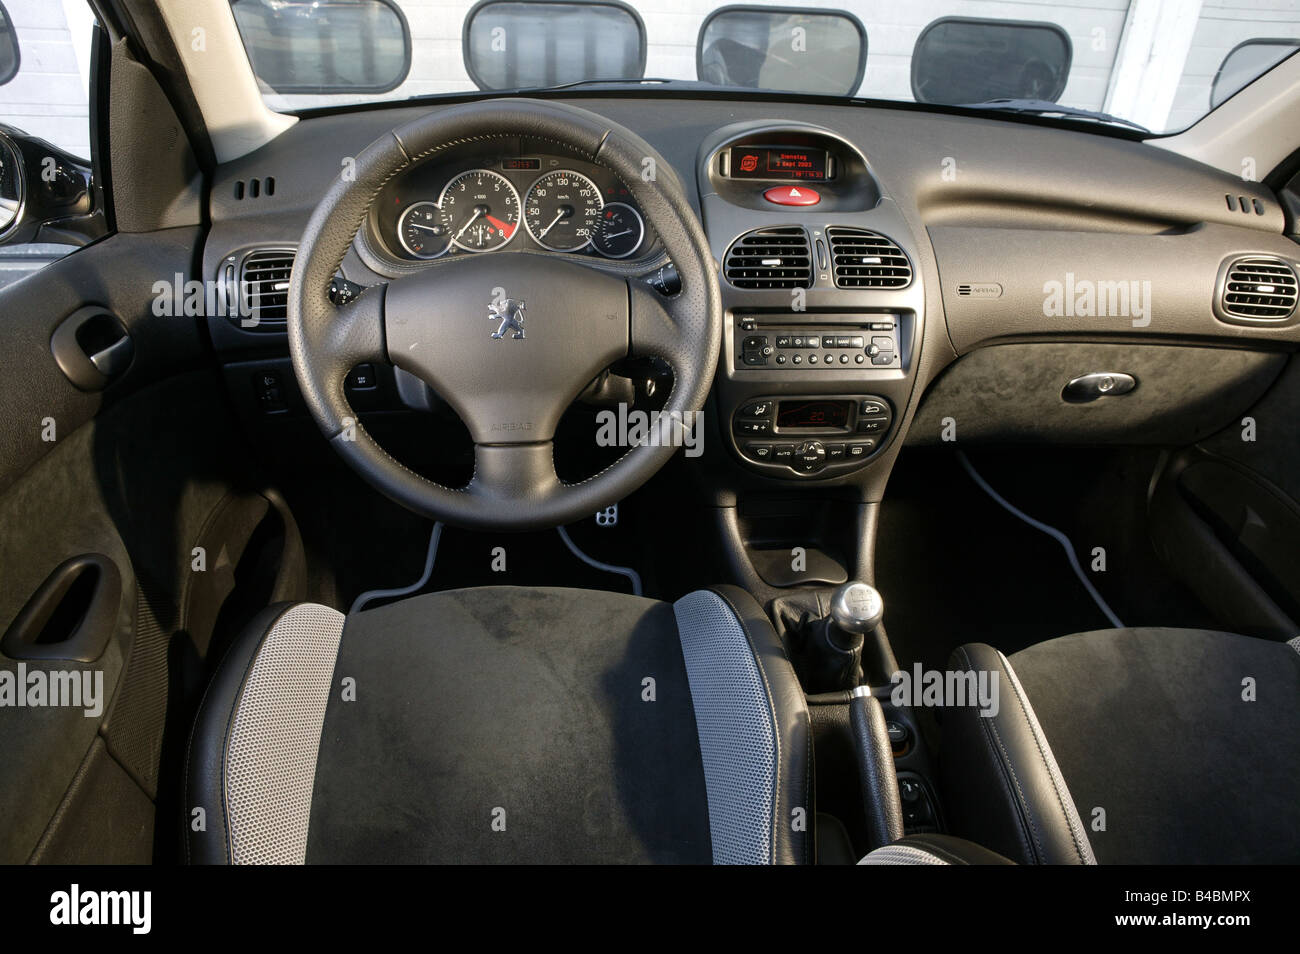 Peugeot 206 RC, Limousine, Auto, kleine ca., Modell Jahr 2003-Silber ...